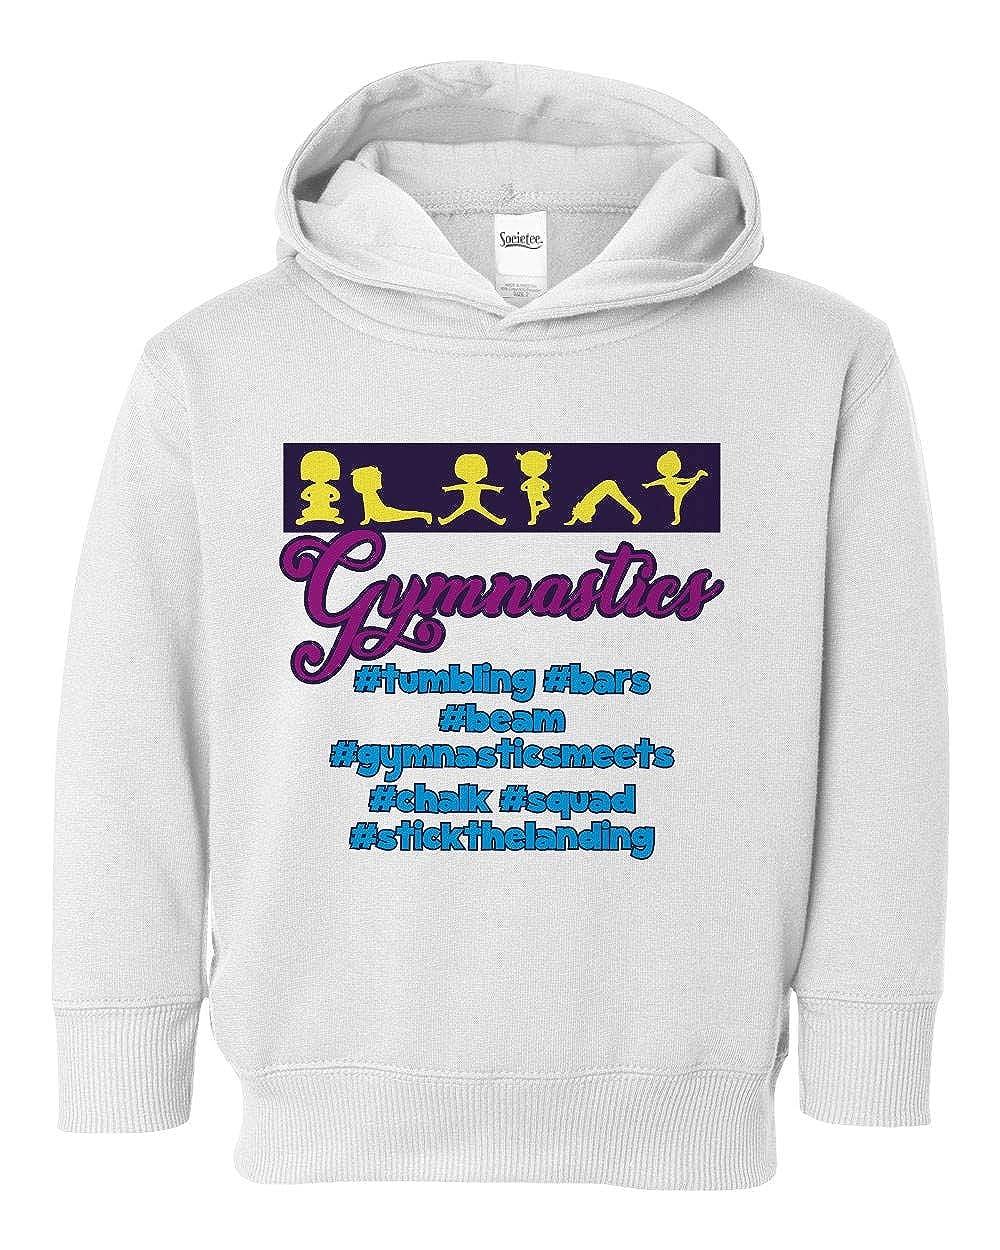 Societee Hashtag Gymnastics Sports Cute Girls Toddler Hooded Sweatshirt